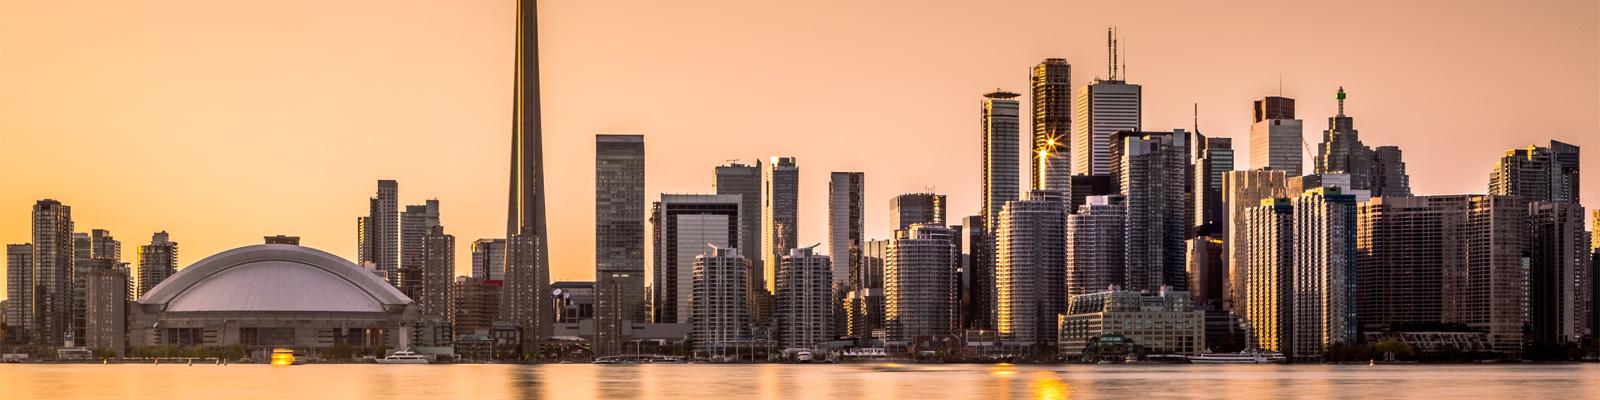 Downtown Toronto, Ontario at Sunset